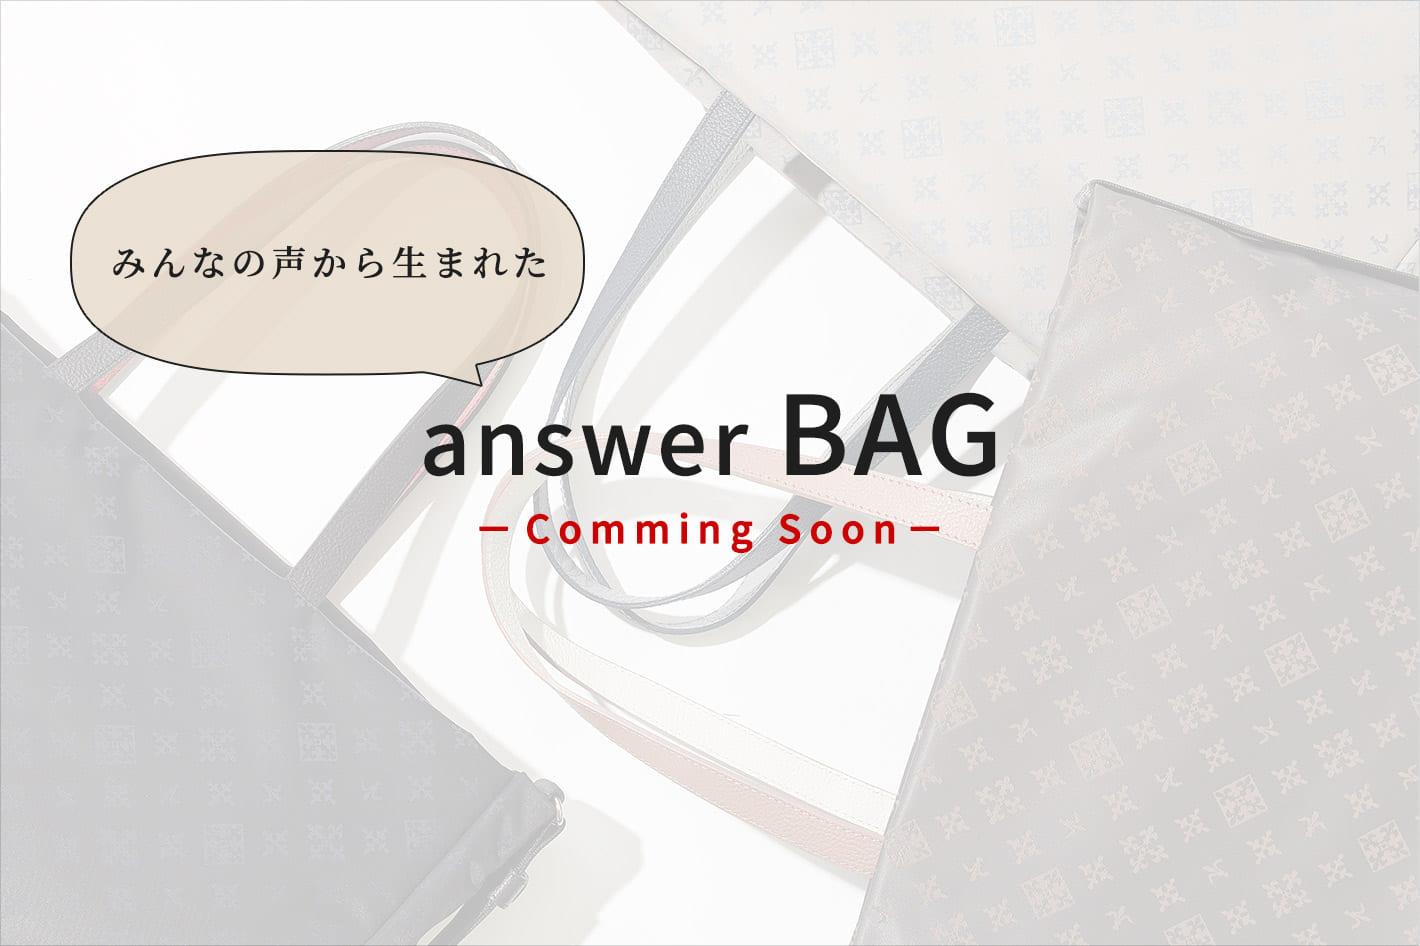 russet みんなの声から生まれた answer BAG -Coming Soon-